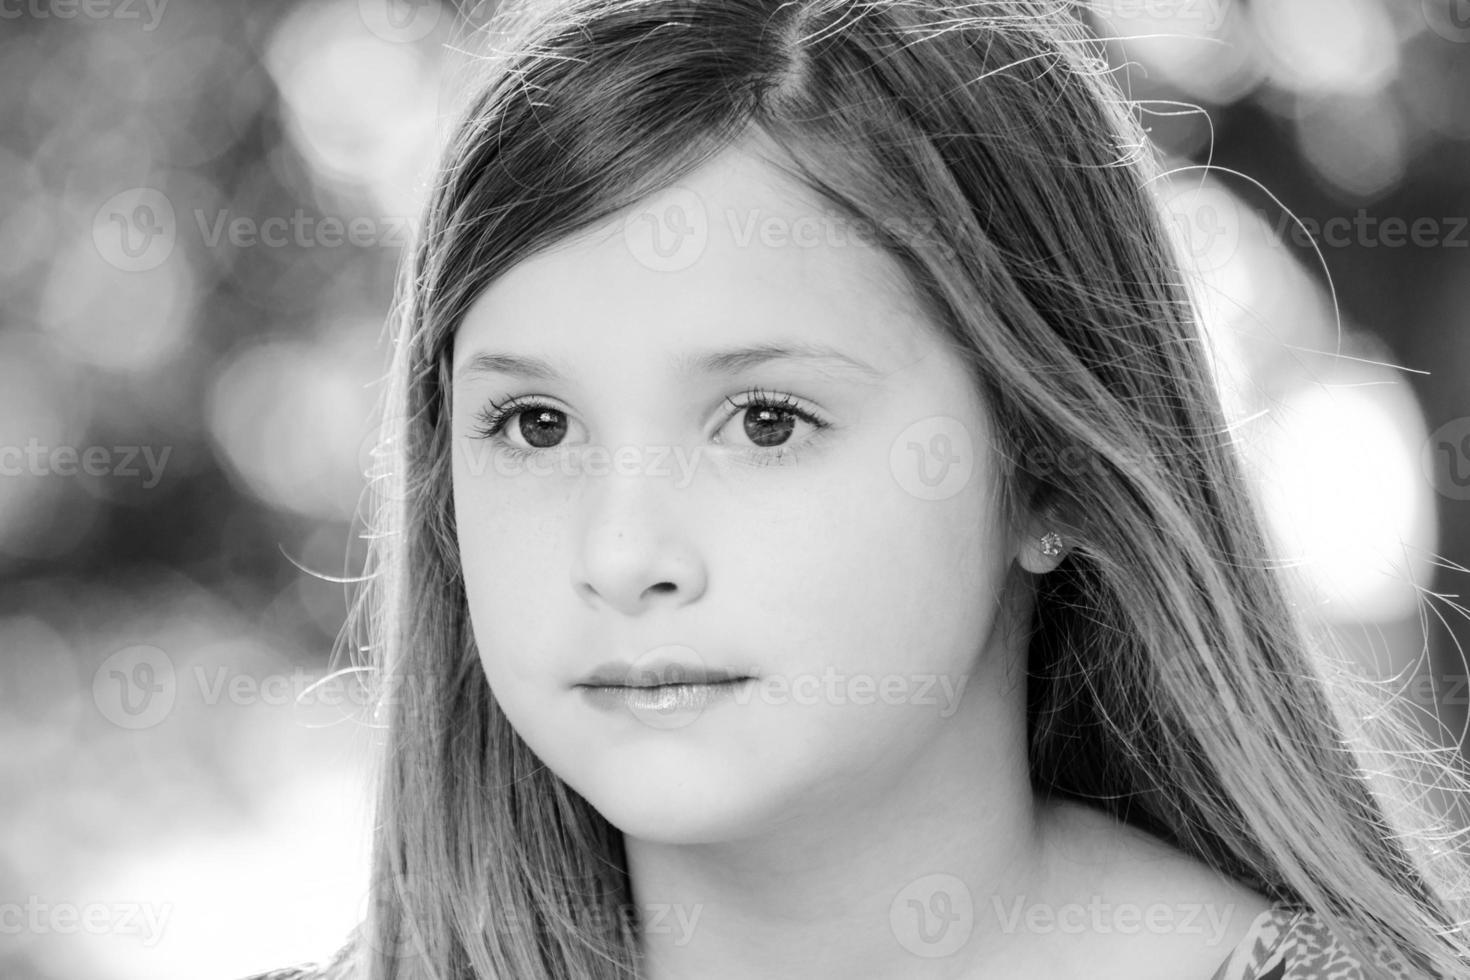 jovem close-up foto